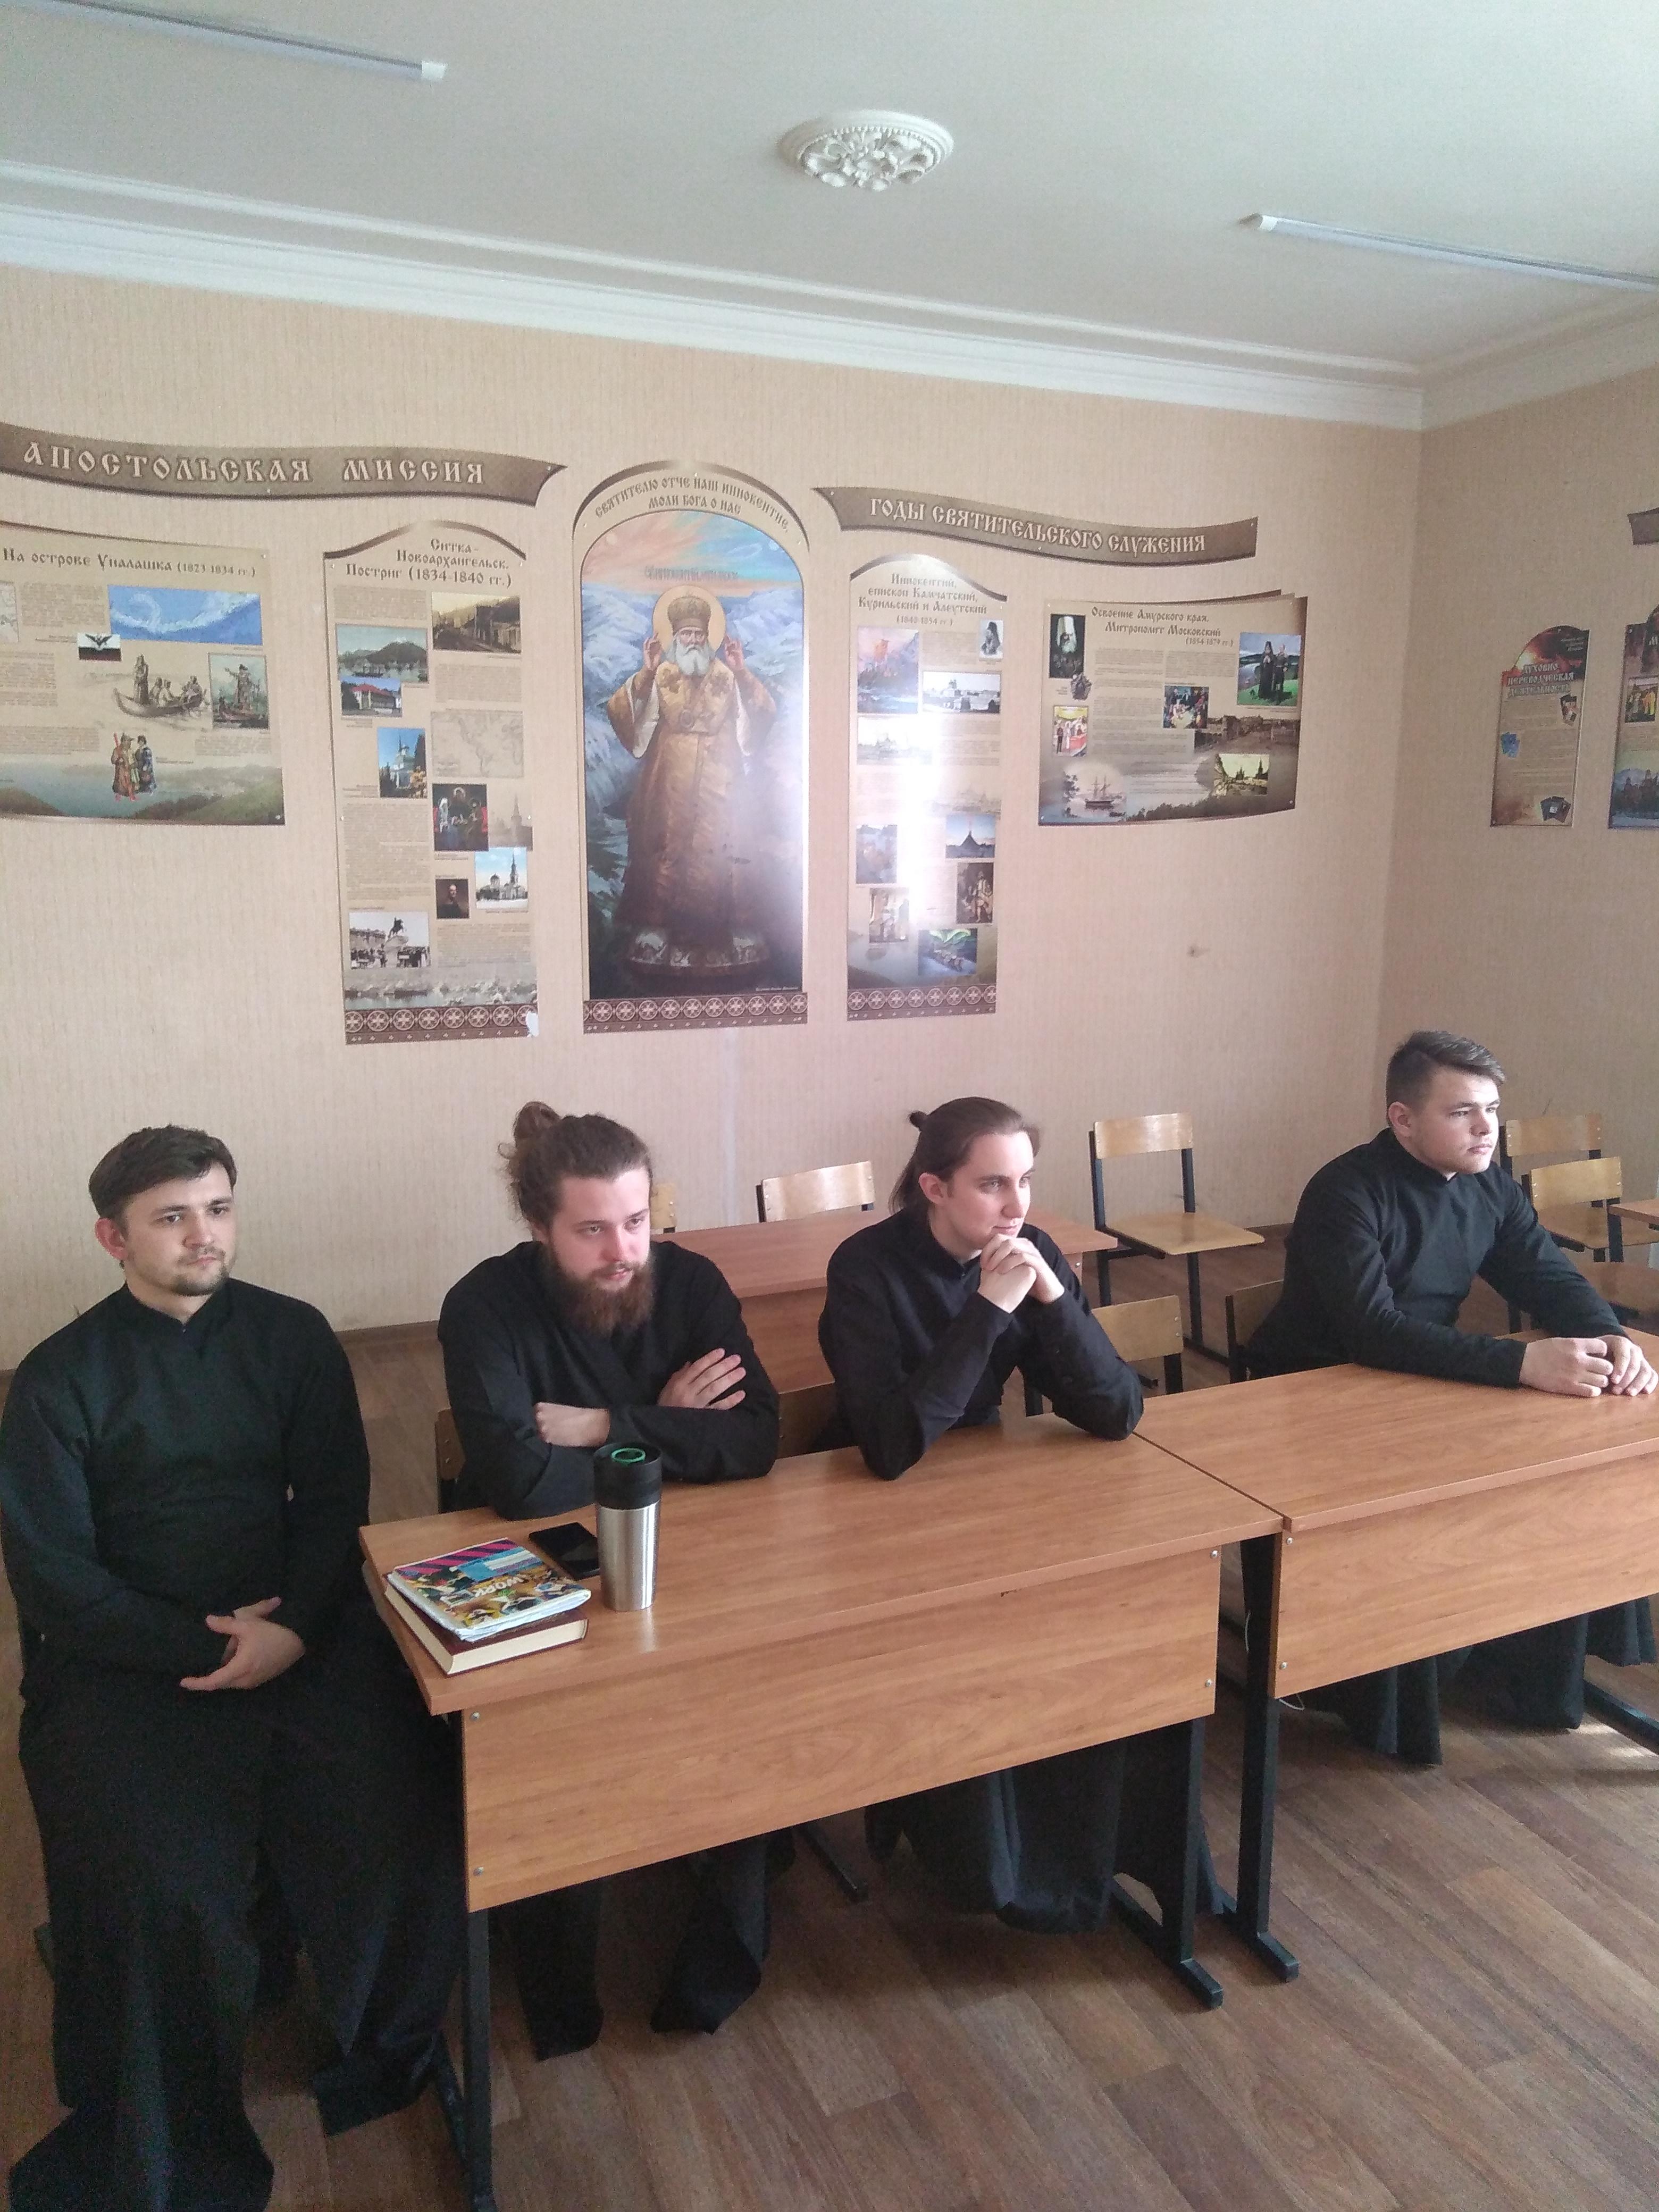 http://bel-seminaria.ru/wp-content/uploads/2021/04/IMG_20210409_141009.jpg